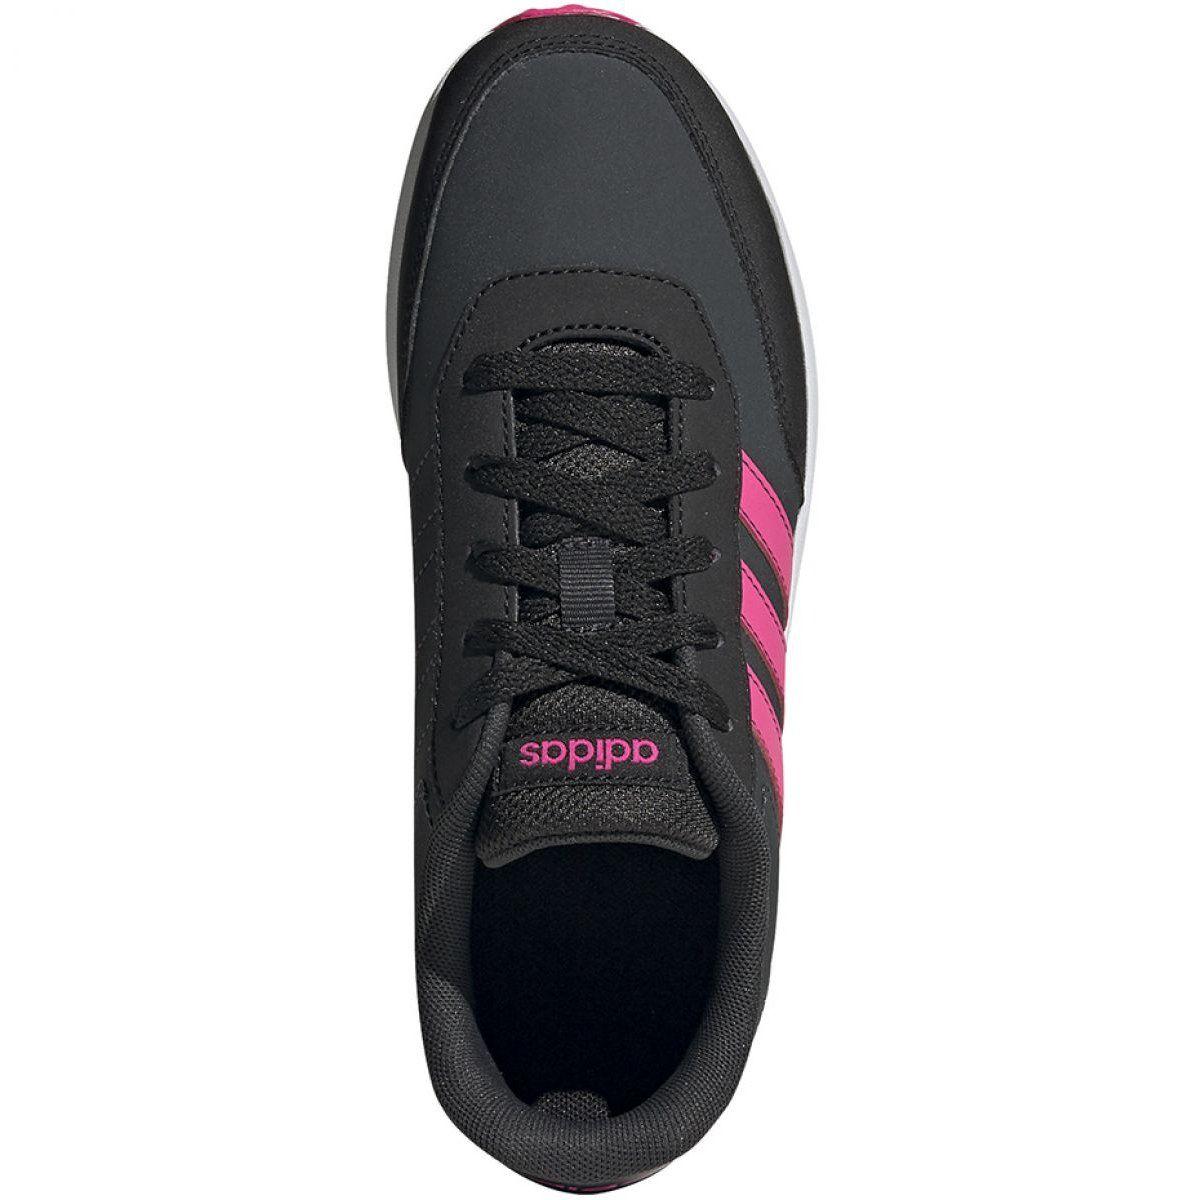 Buty Adidas Vs Switch 2 K Jr G25920 Czarne Adidas Shoes Sneakers